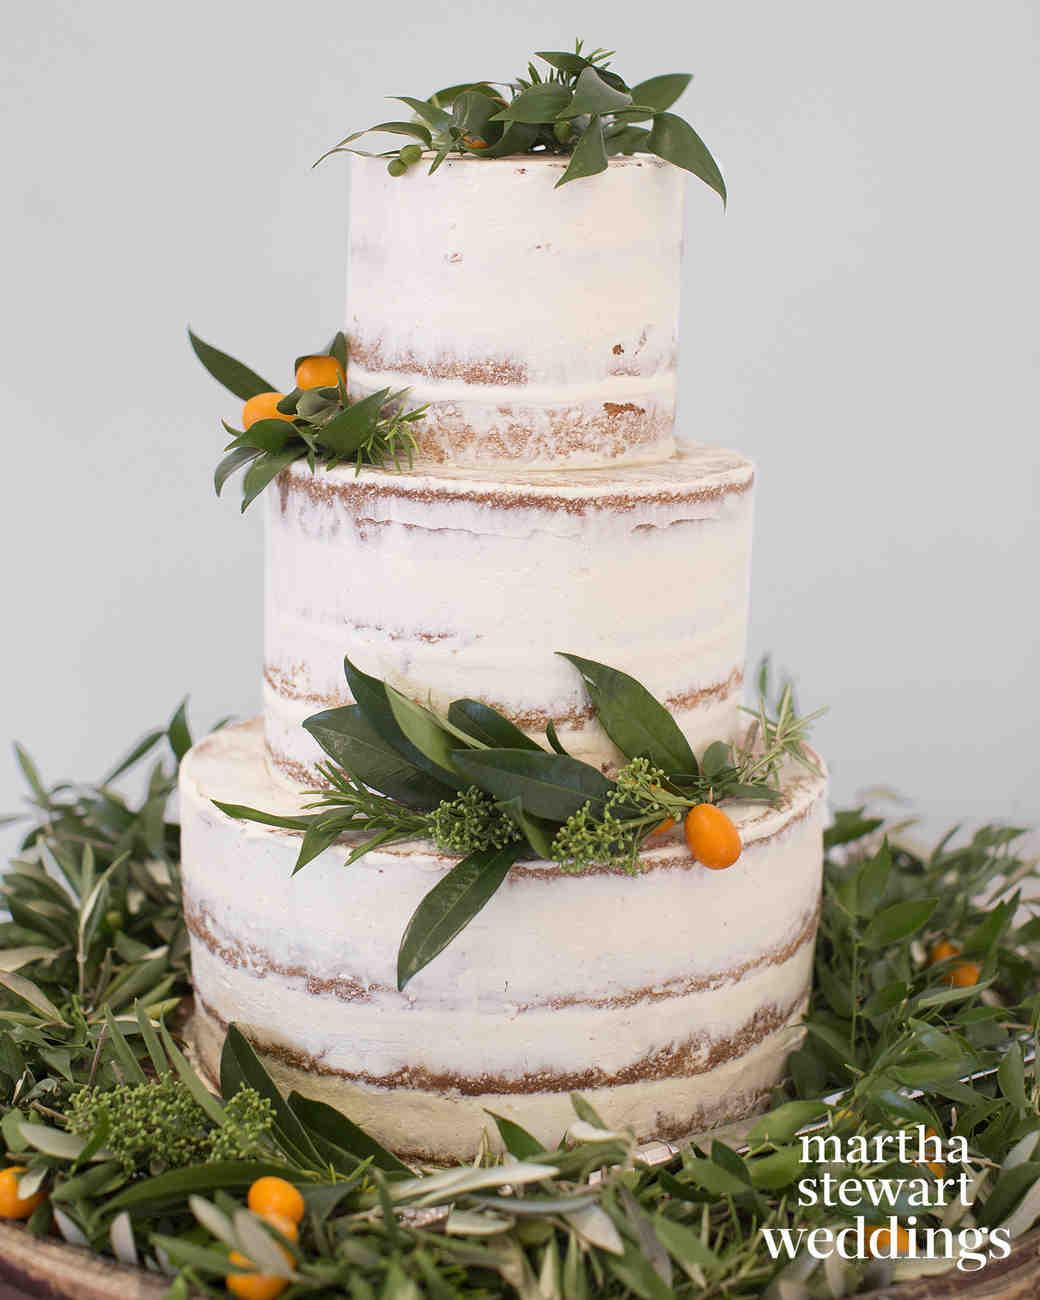 Nearly Naked Wedding Cake with Greenery and Kumquats